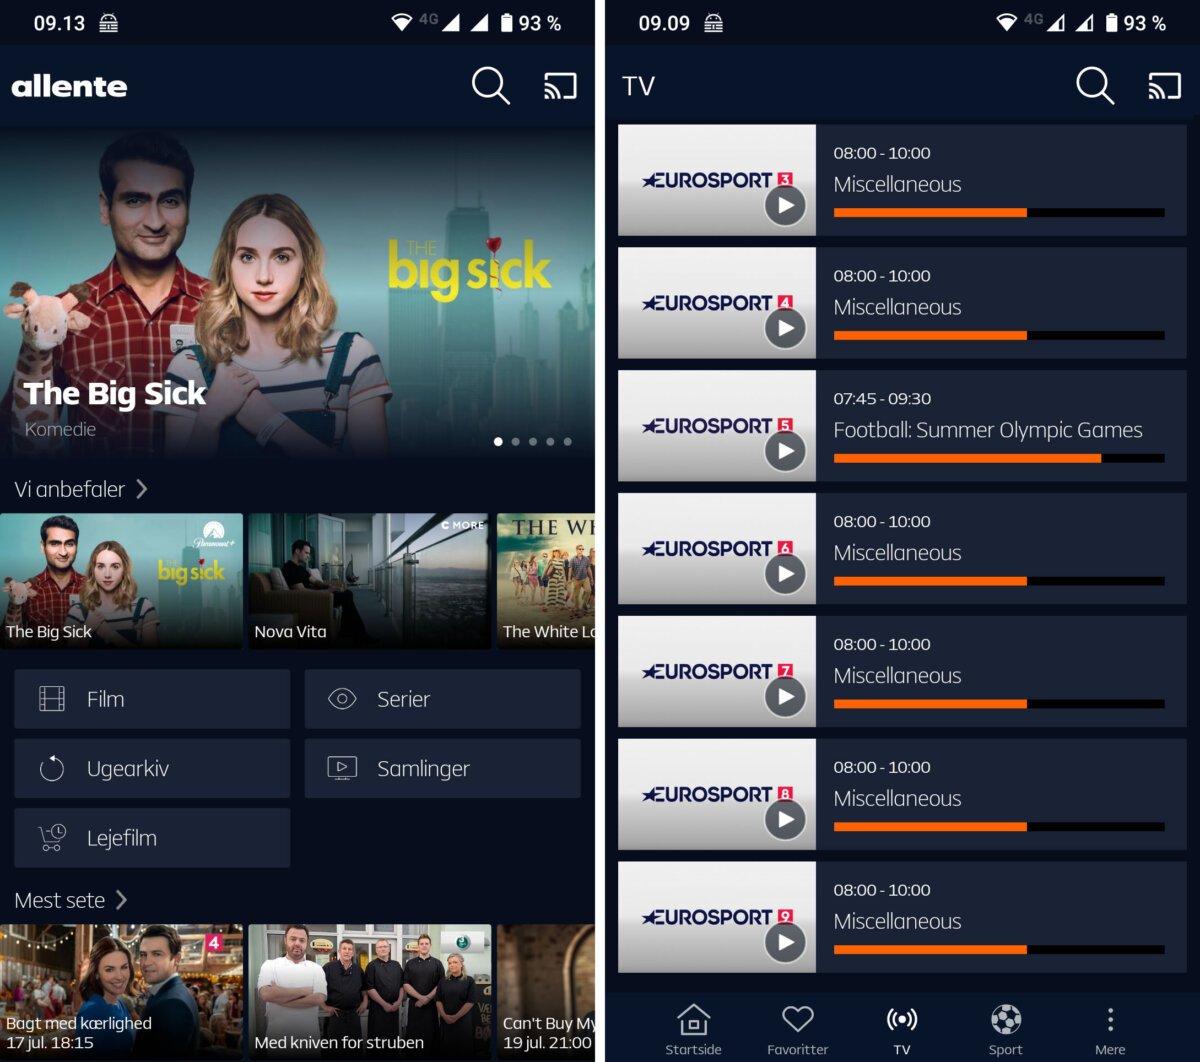 allente app Eurosport Screenshot